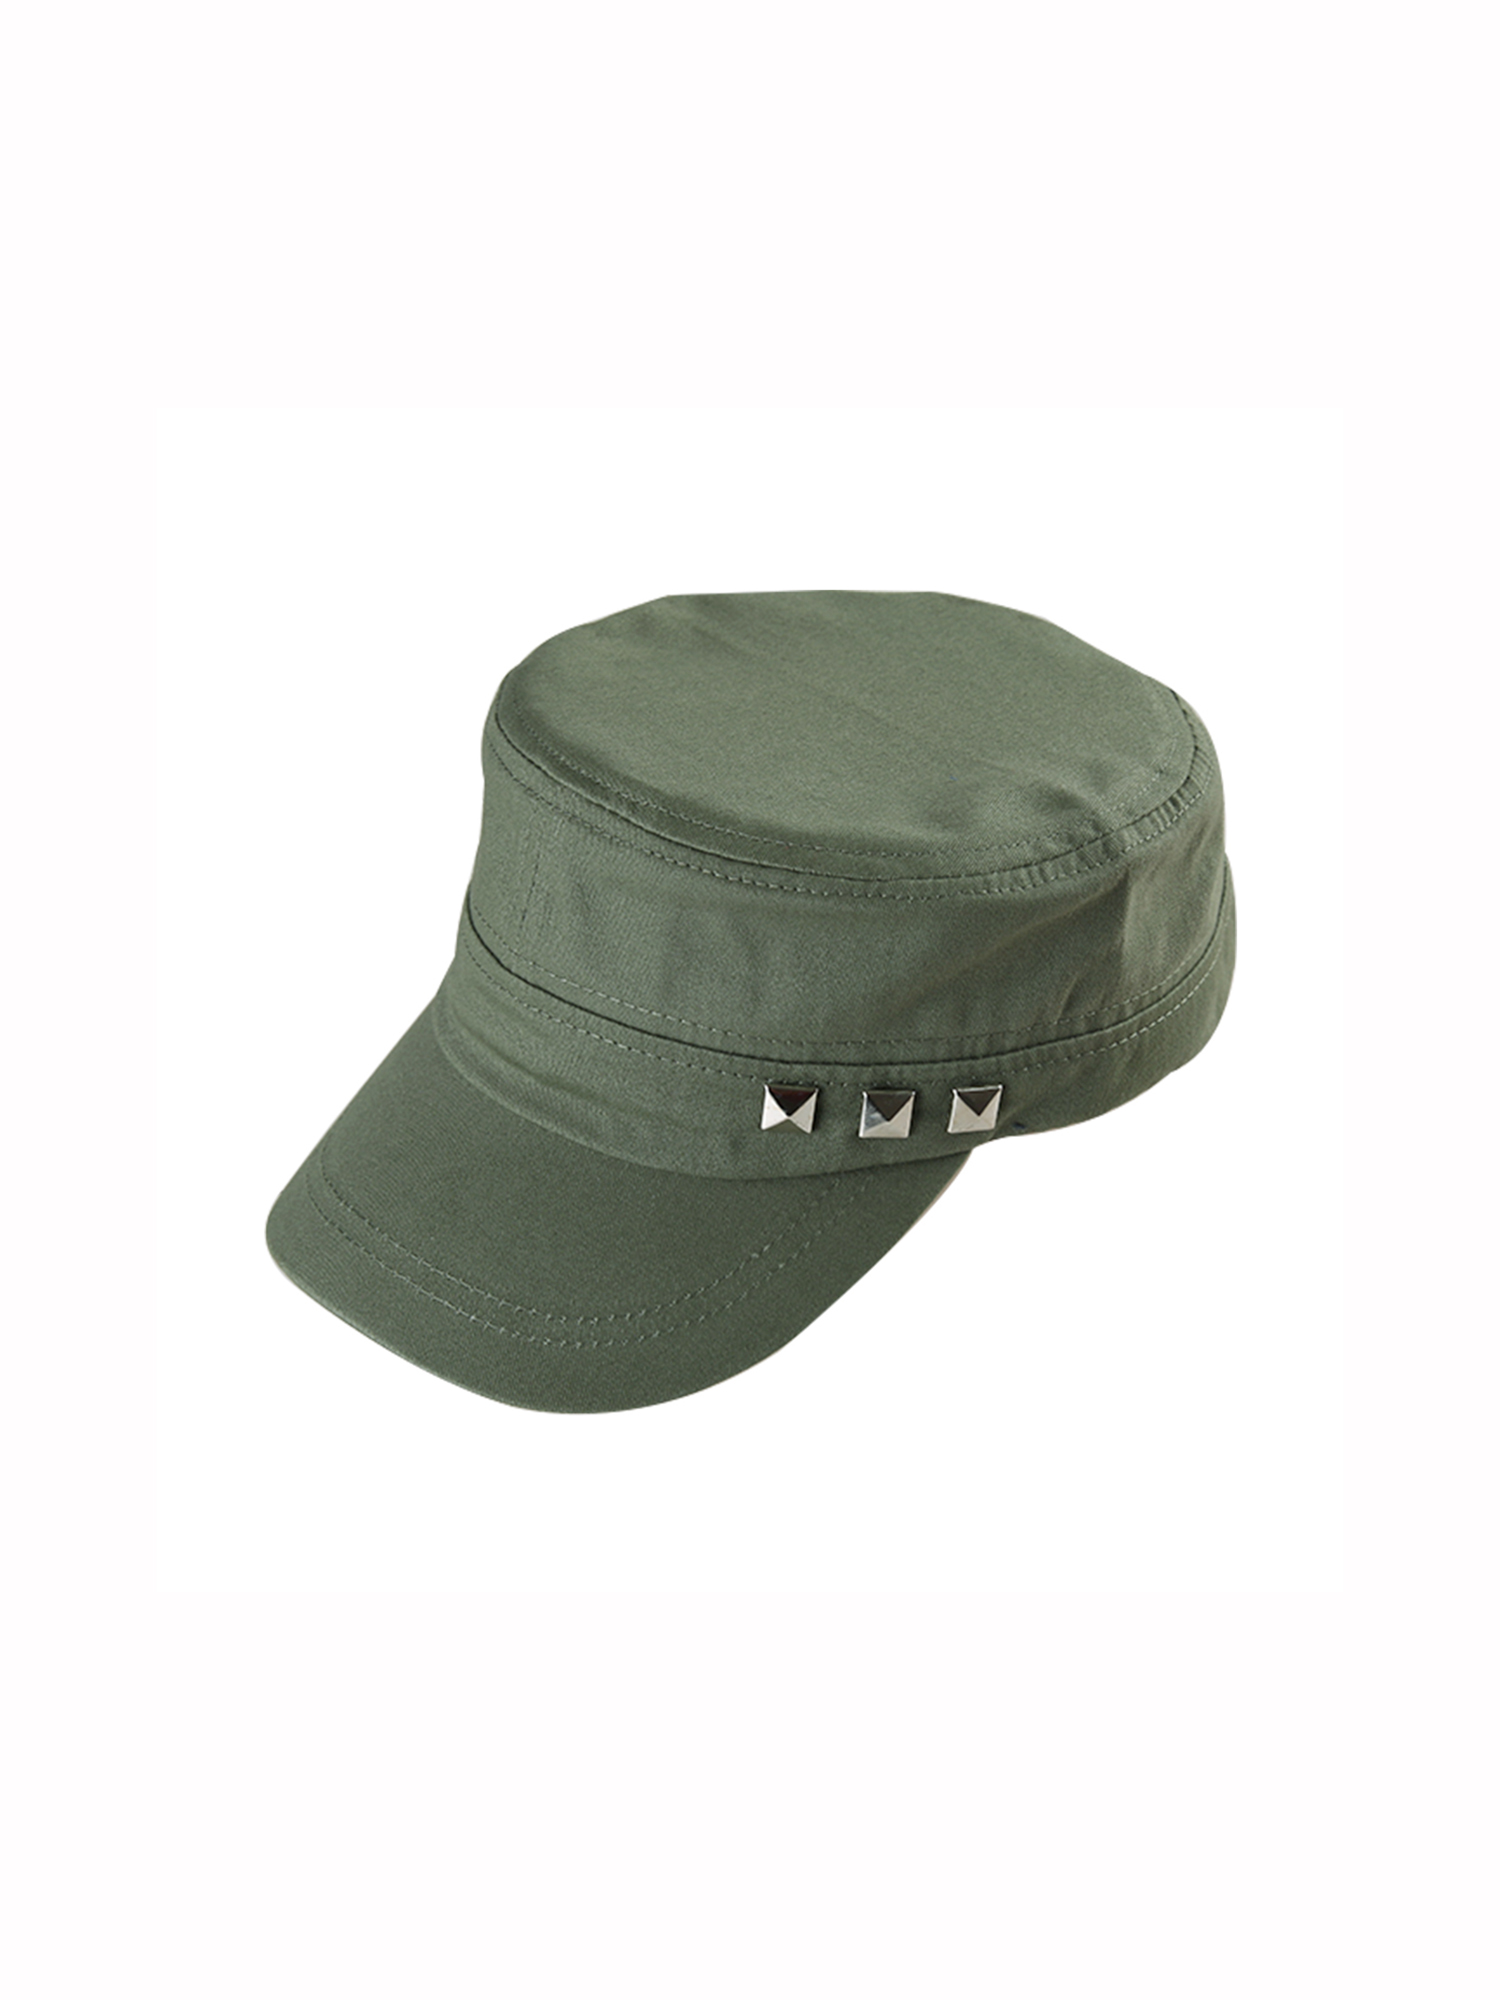 962aaa021ed Unique Bargains Unisex s Vintage Flat Top Peaked Cotton Baseball Adjustable  Cadet Cap Army Green